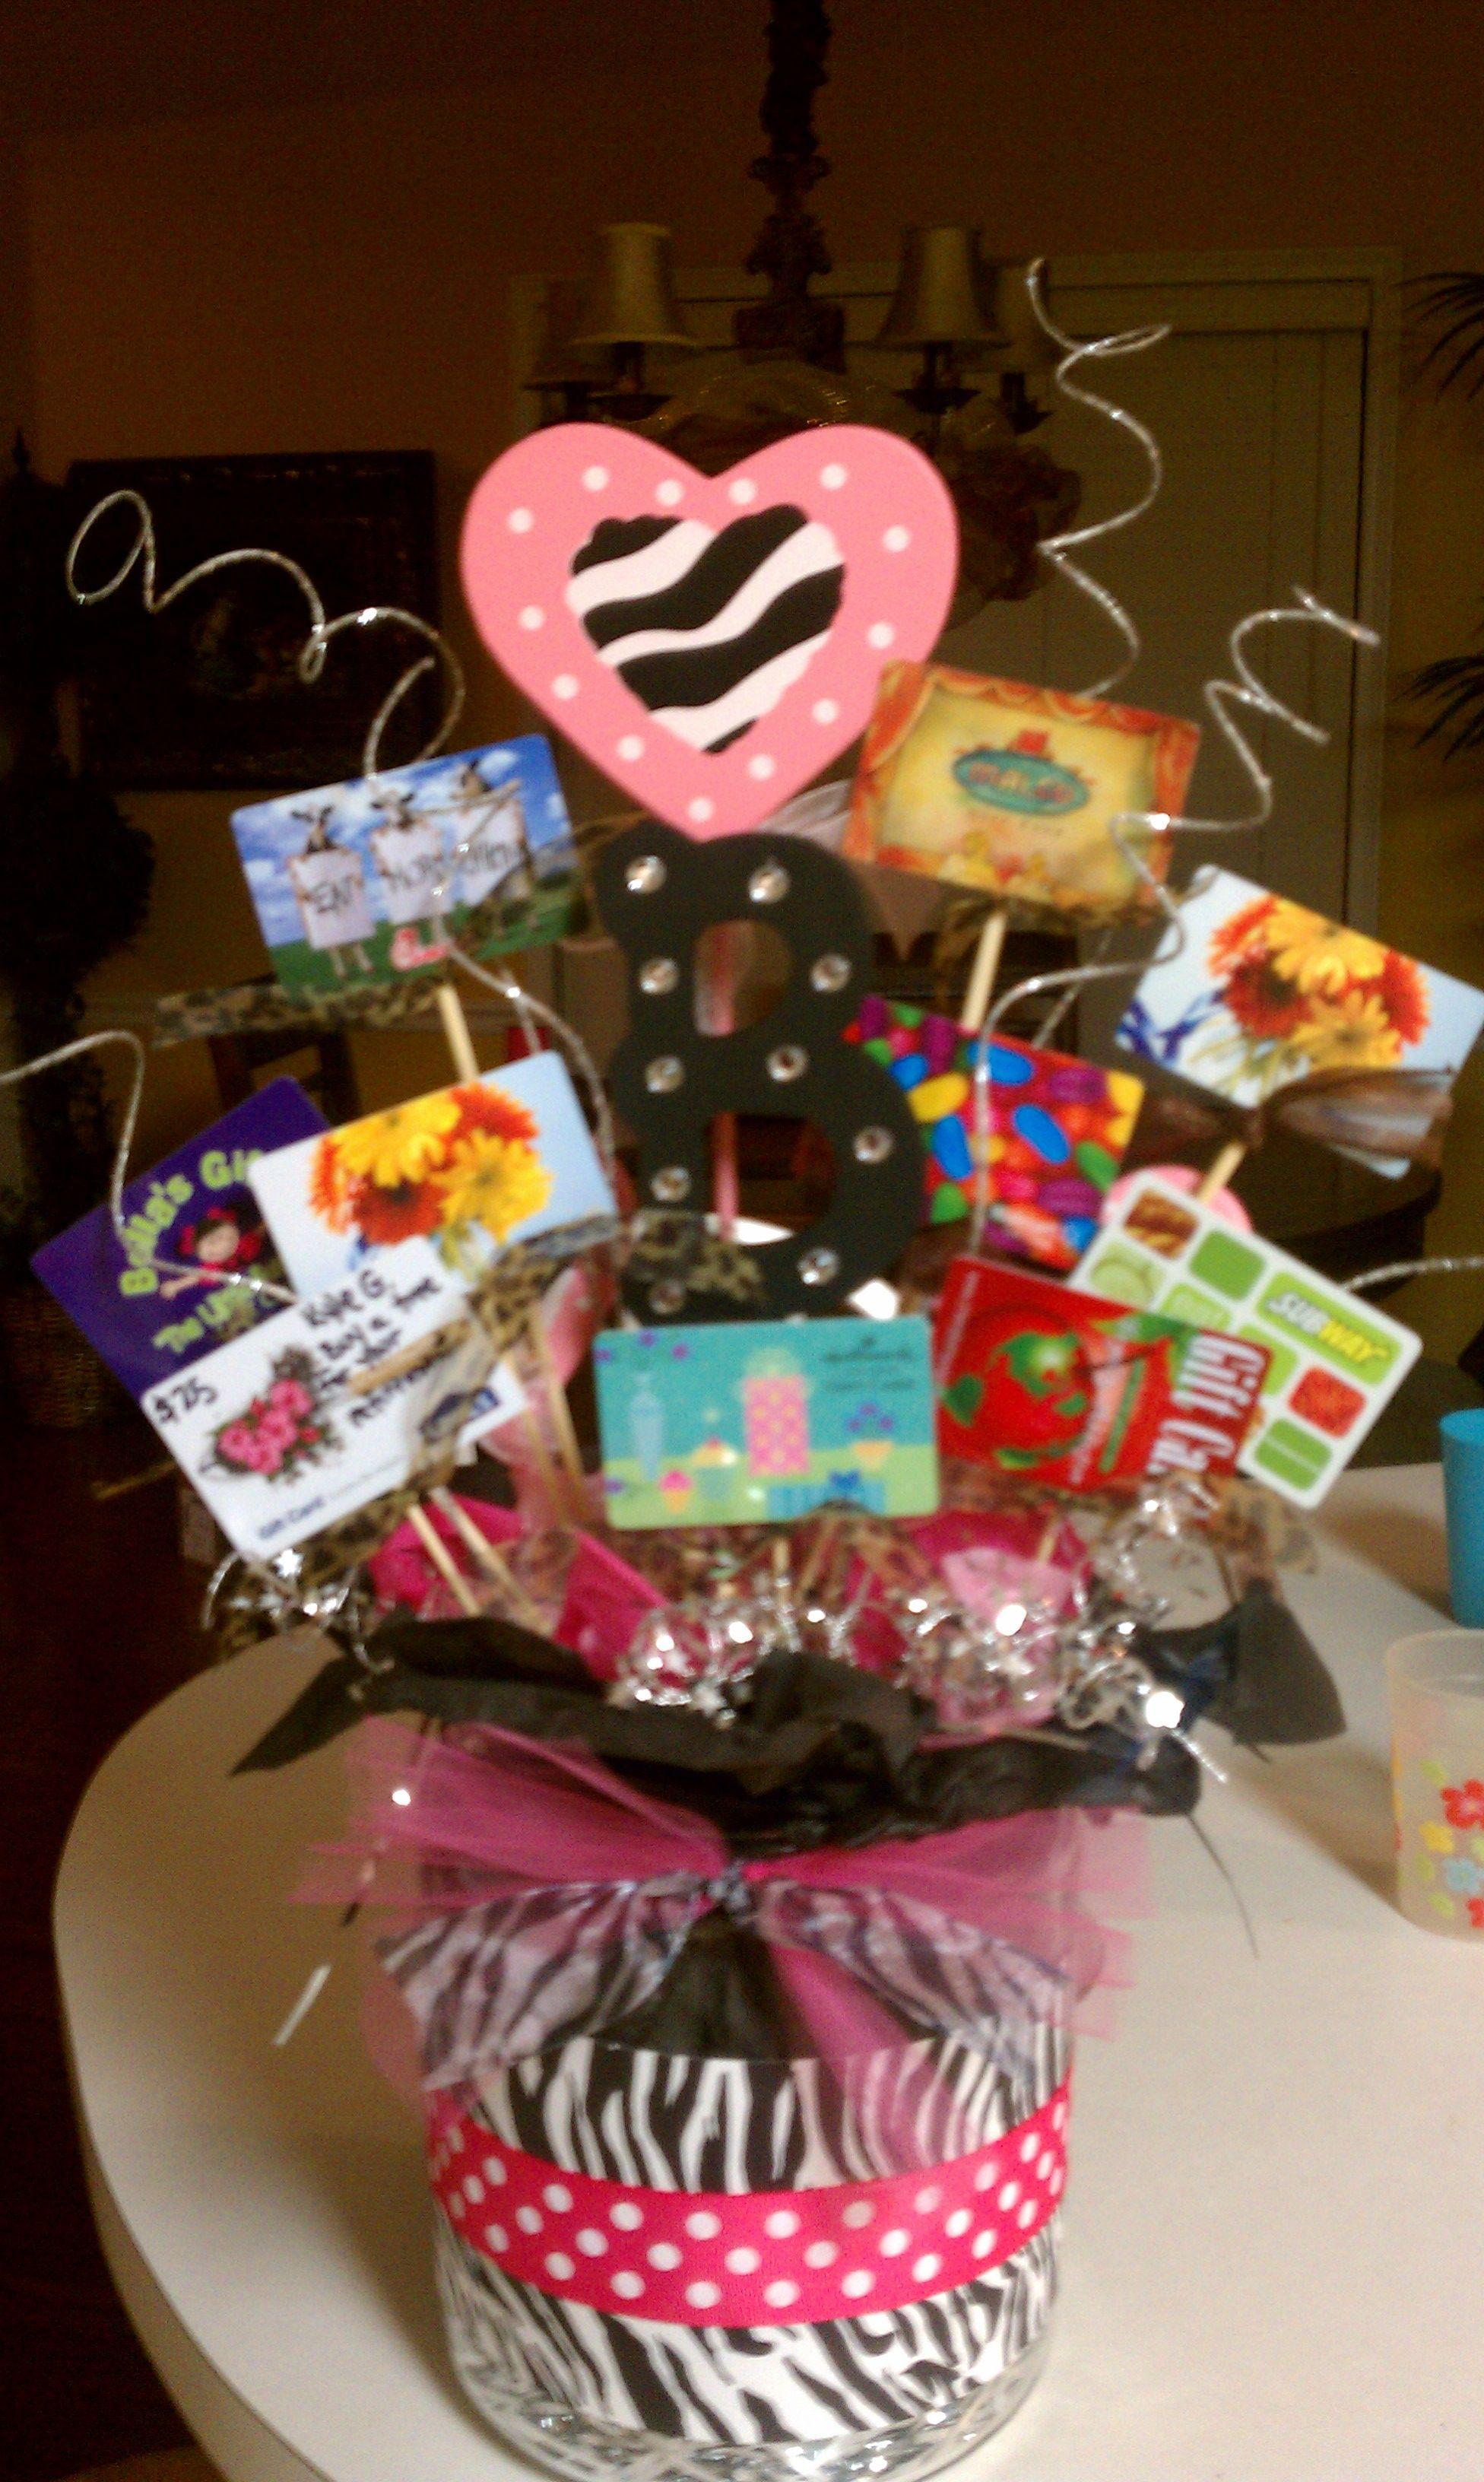 Gift card bouquet marsha penner lael girls pinterest